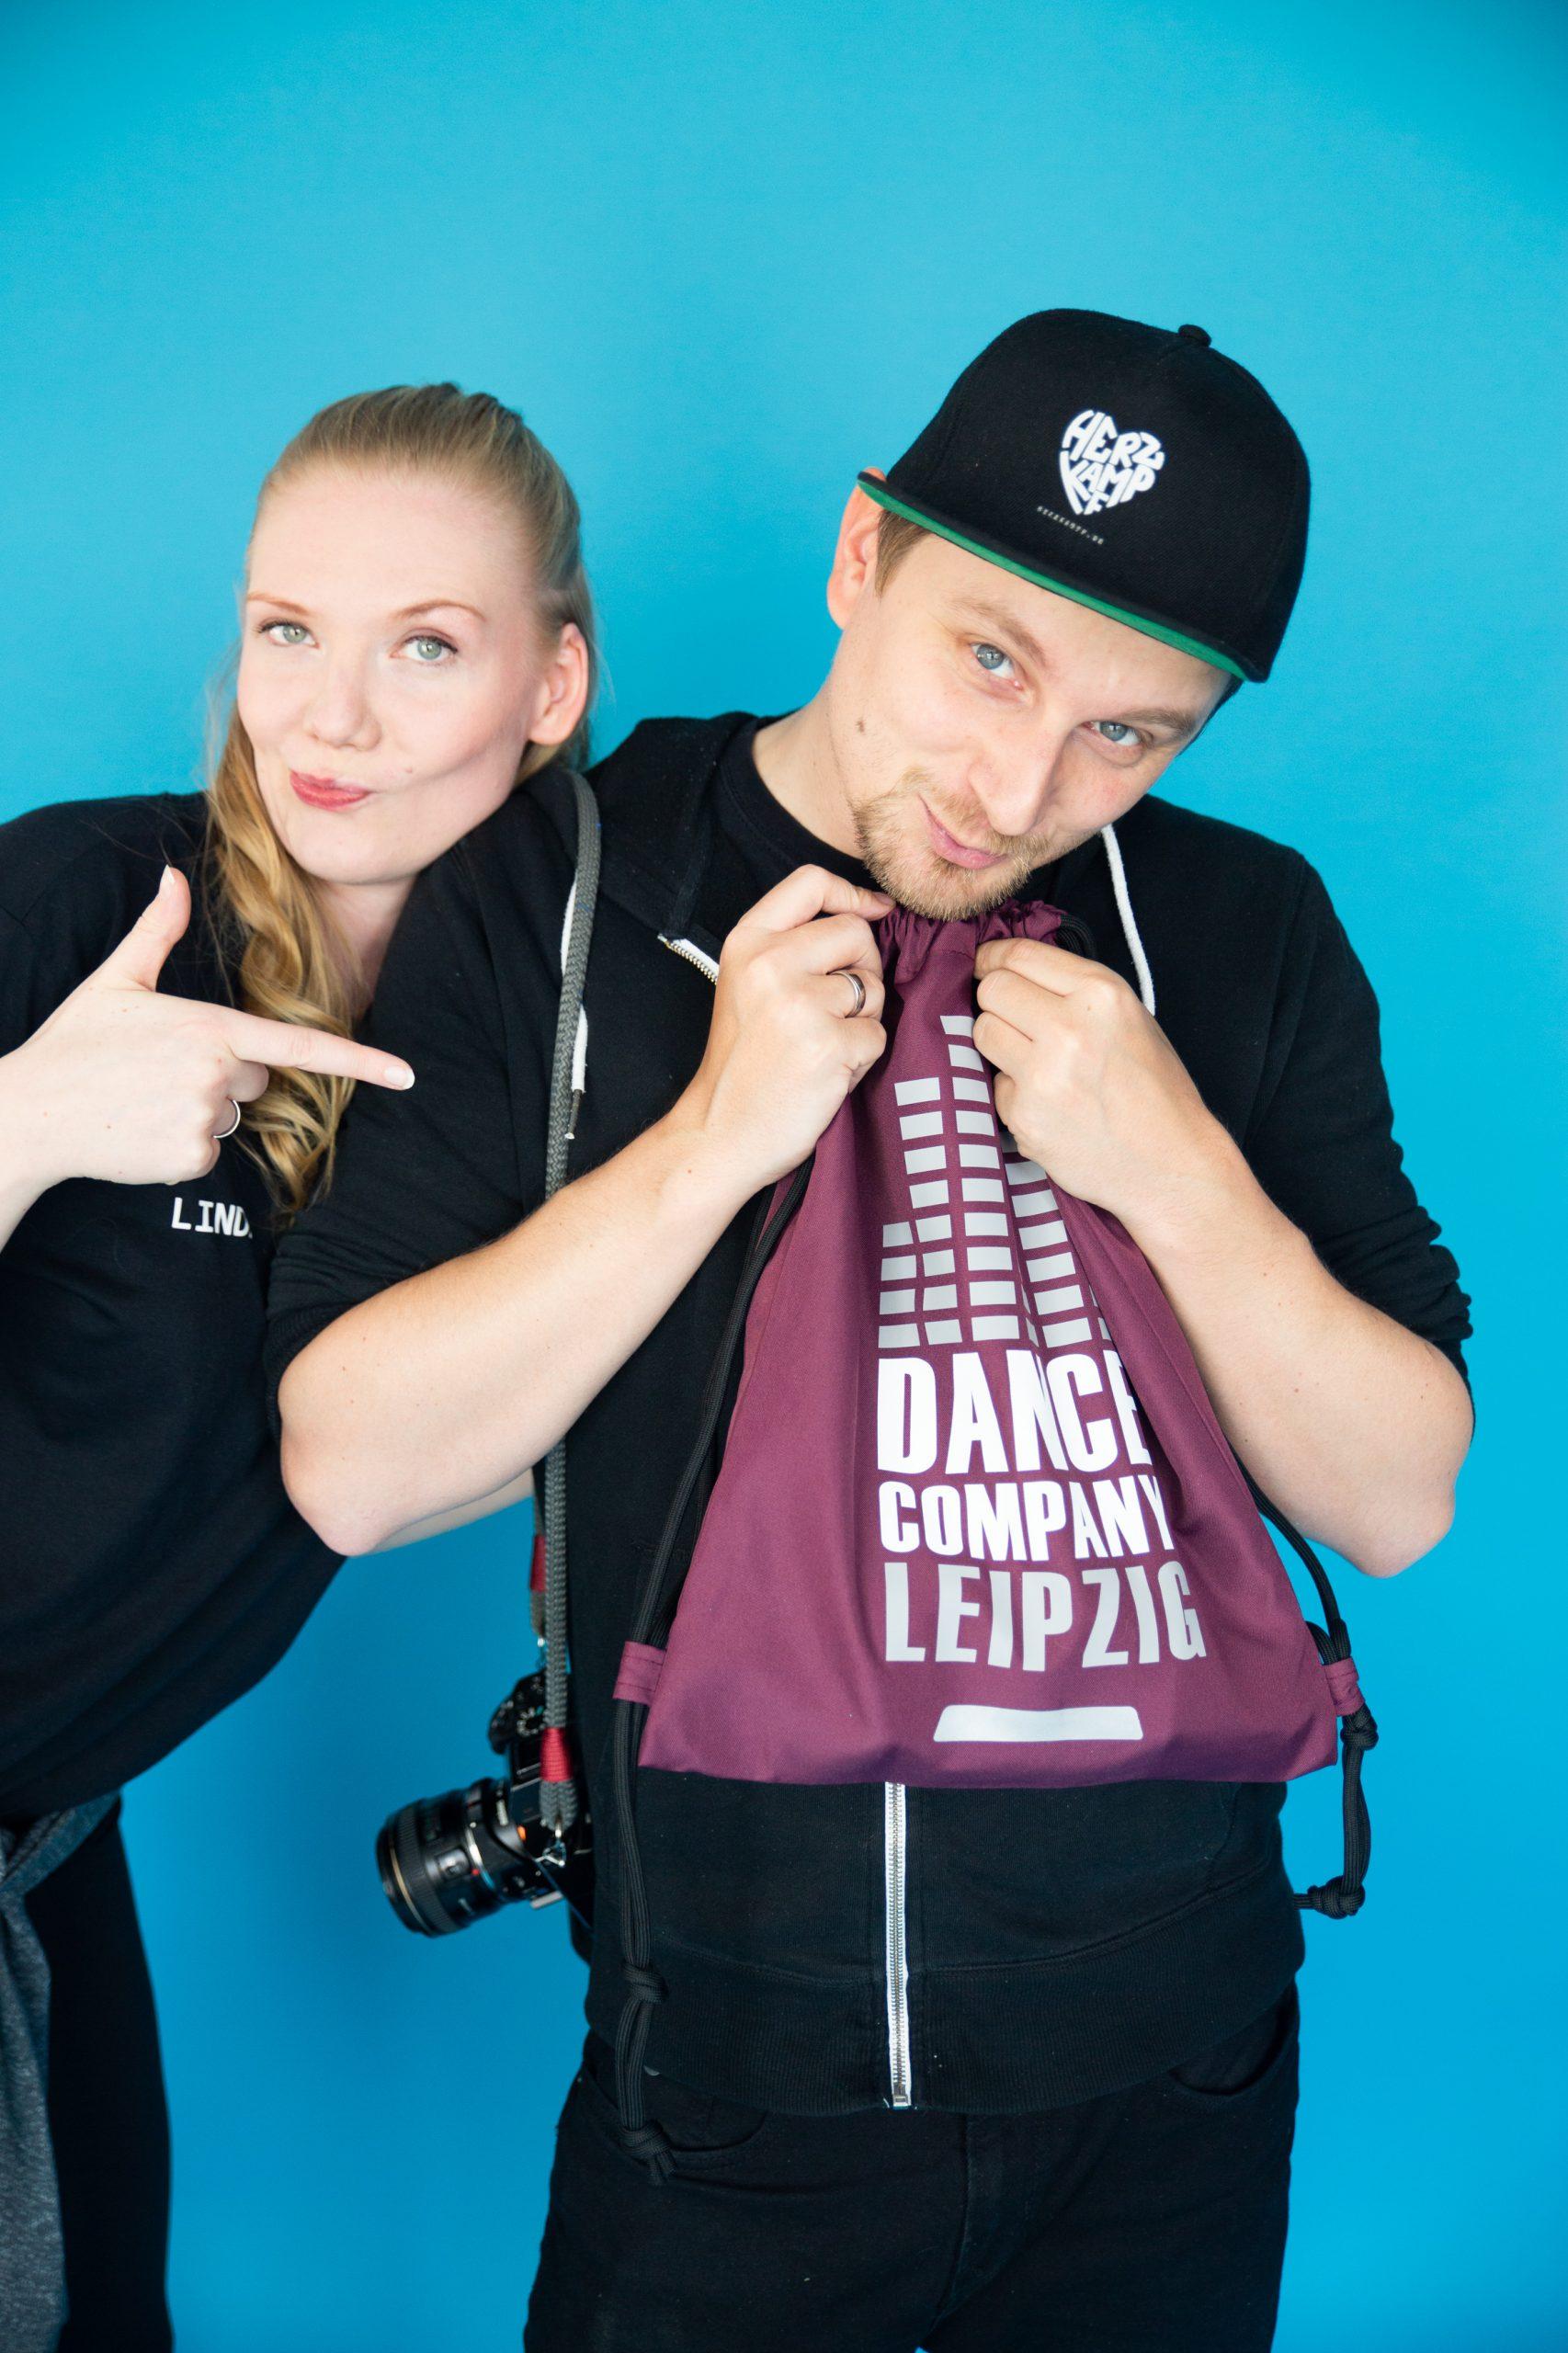 Dance-Company-Leipzig-Tanz-Leipzig-Merch-Shop00022